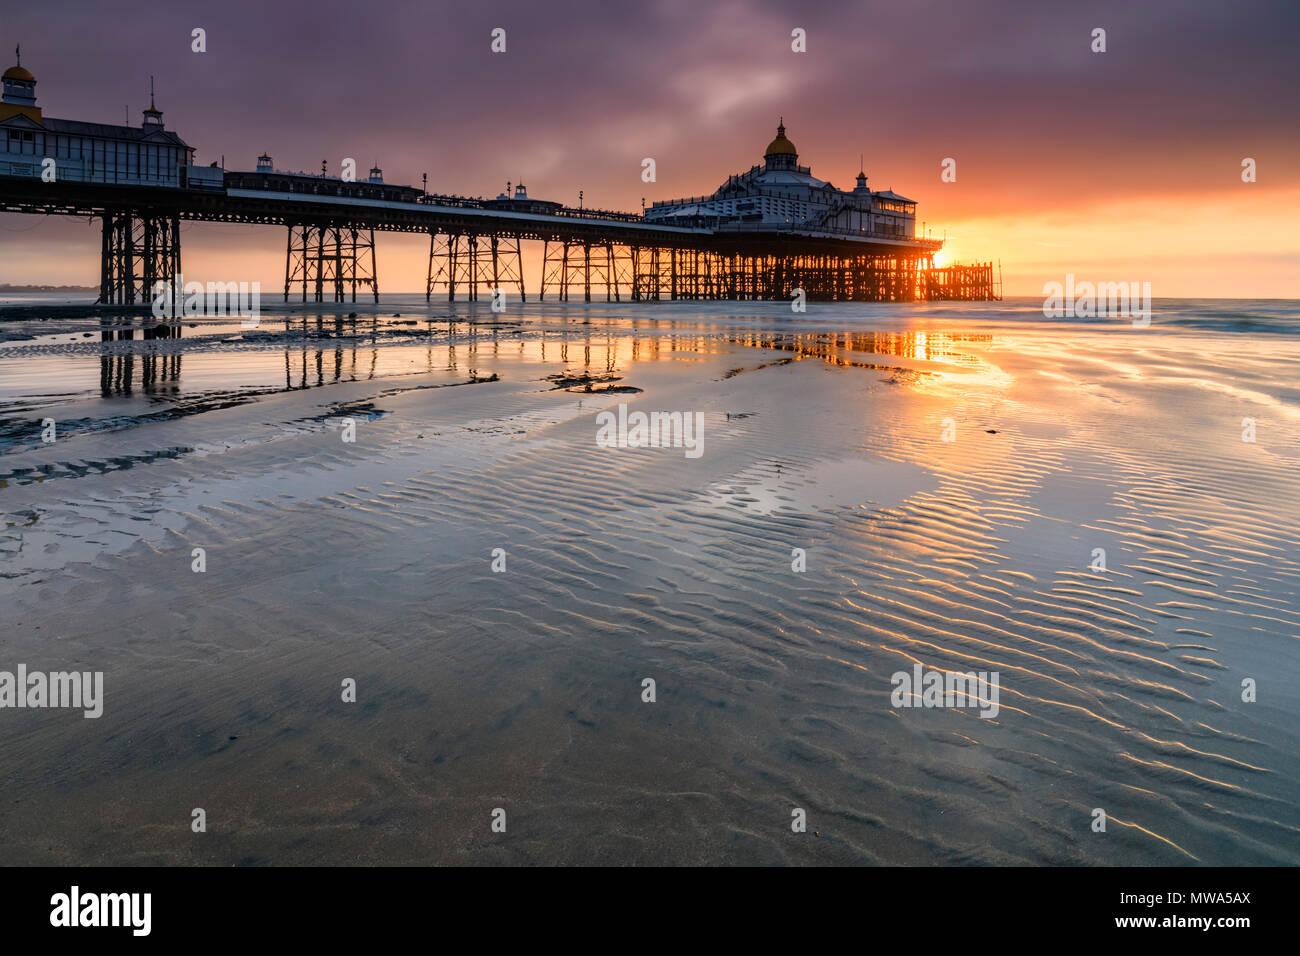 Eastbourne Pier in East Sussex bei Sonnenaufgang erfasst Stockbild